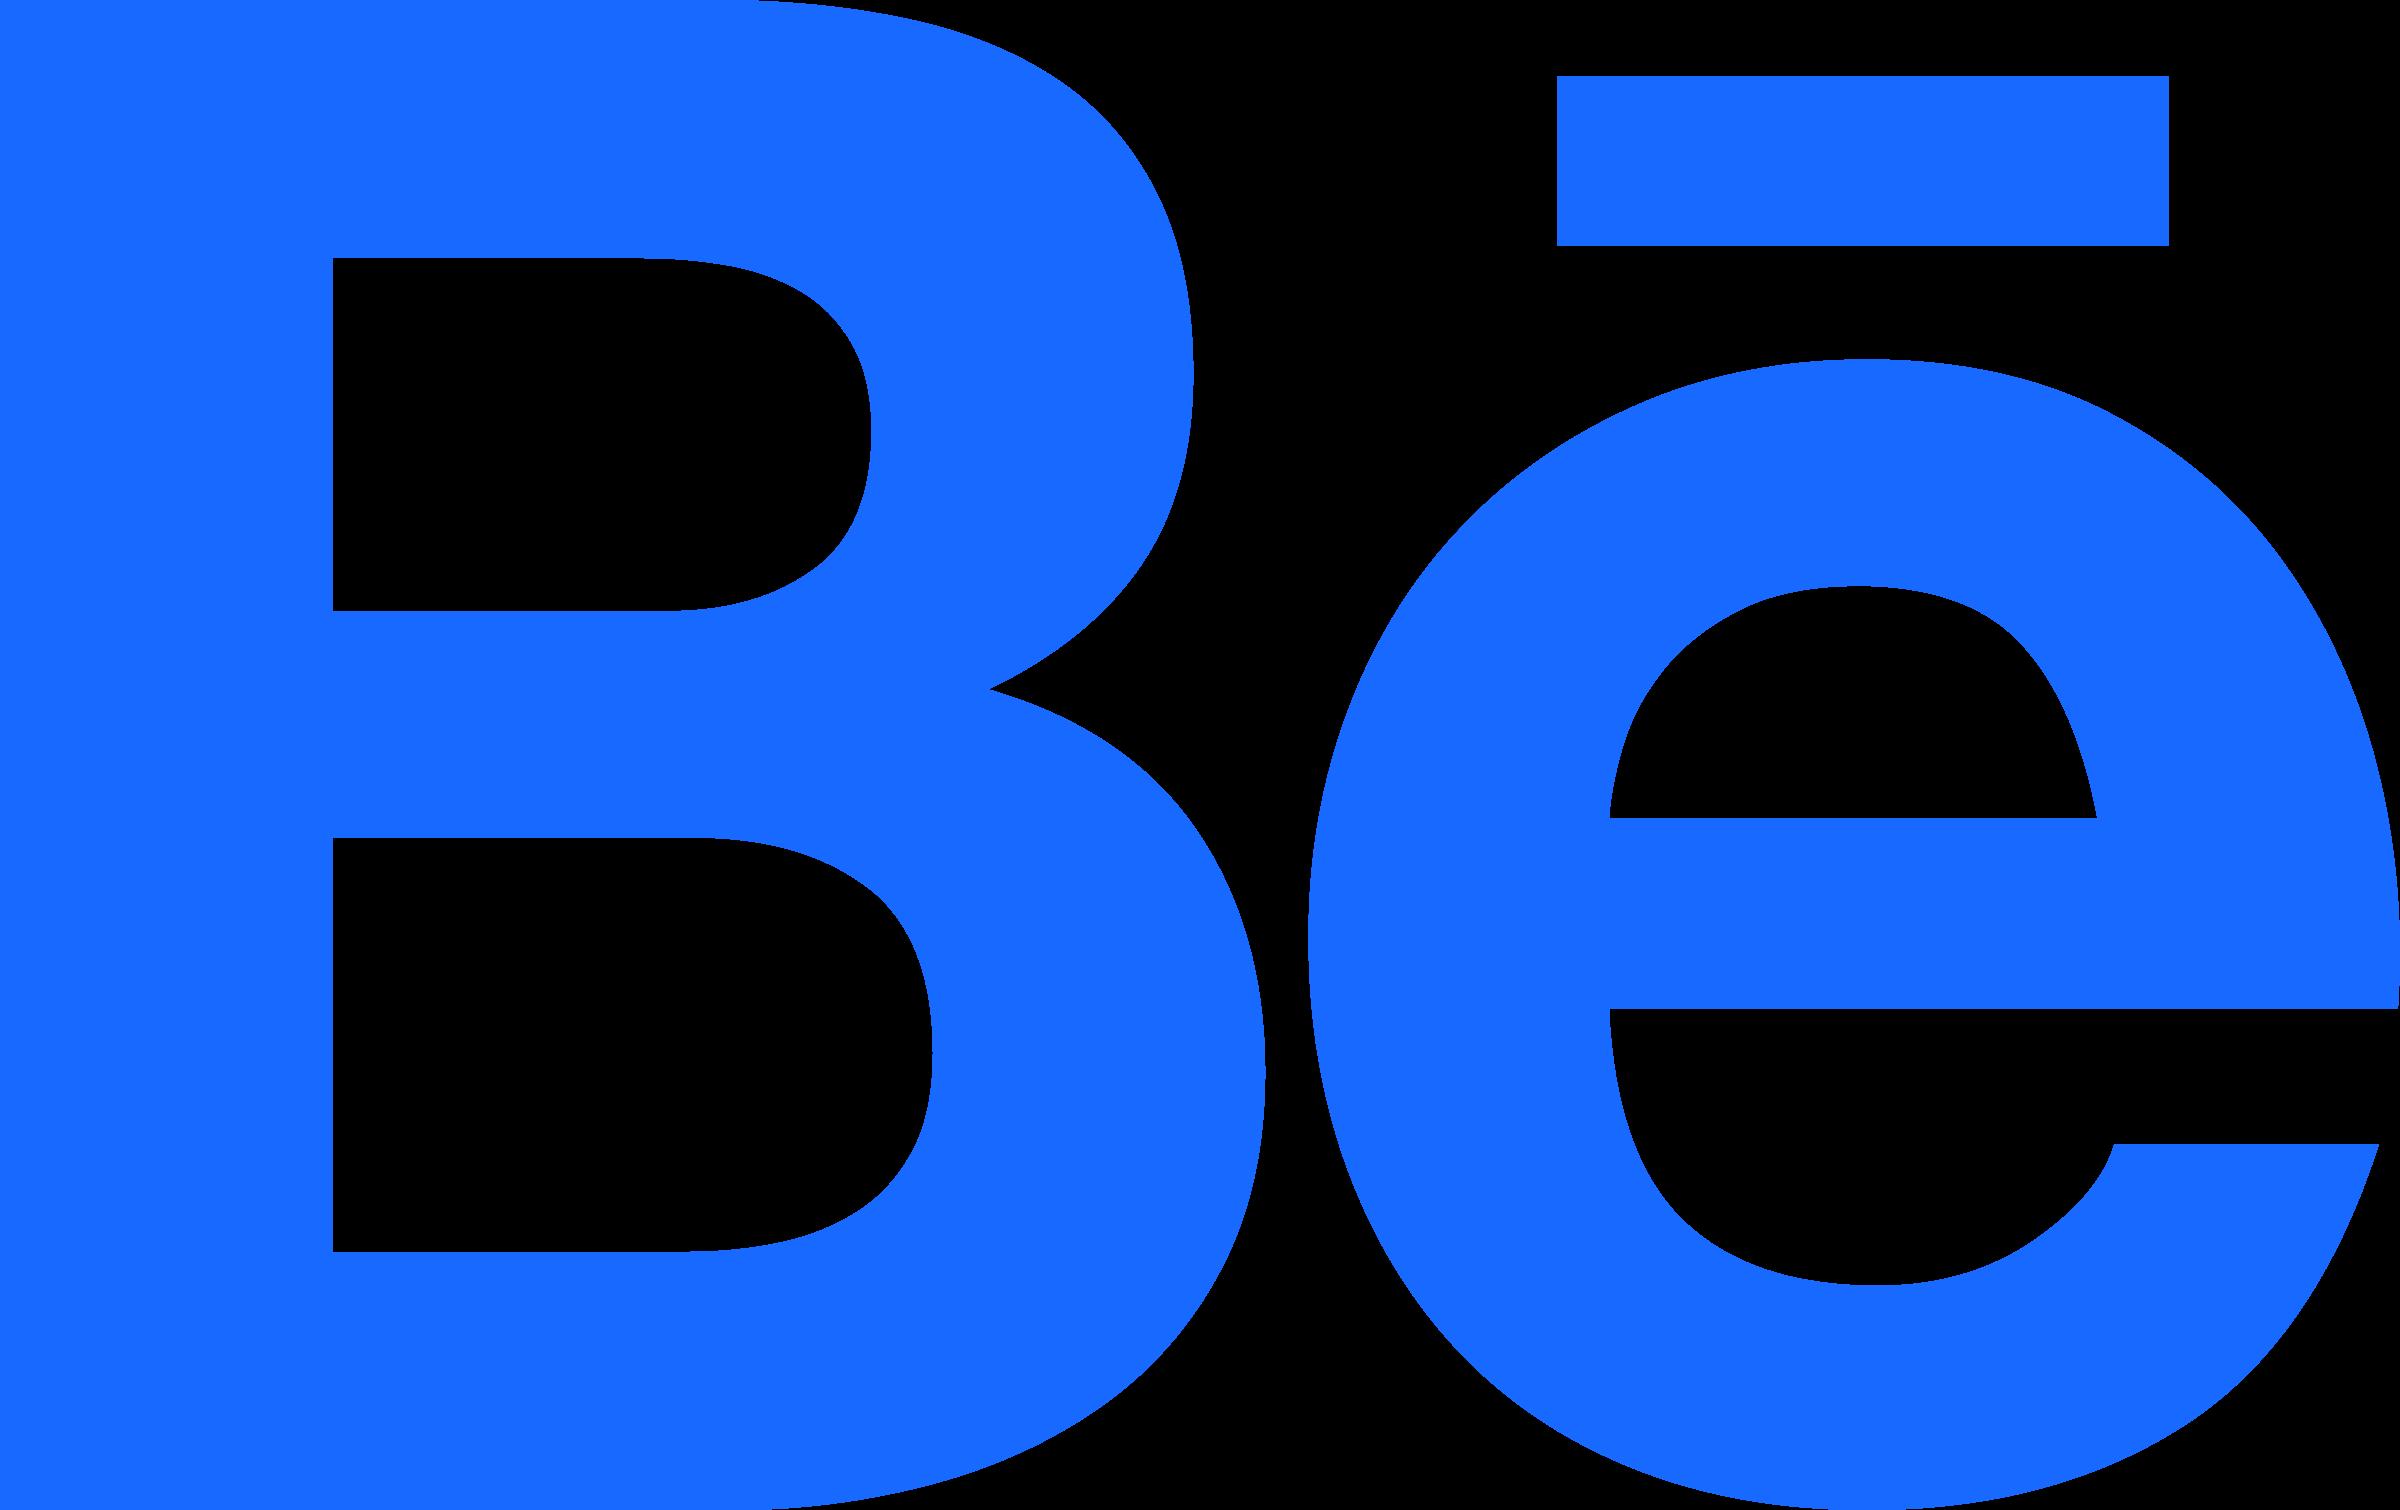 behance-2-logo-png-transparent.png